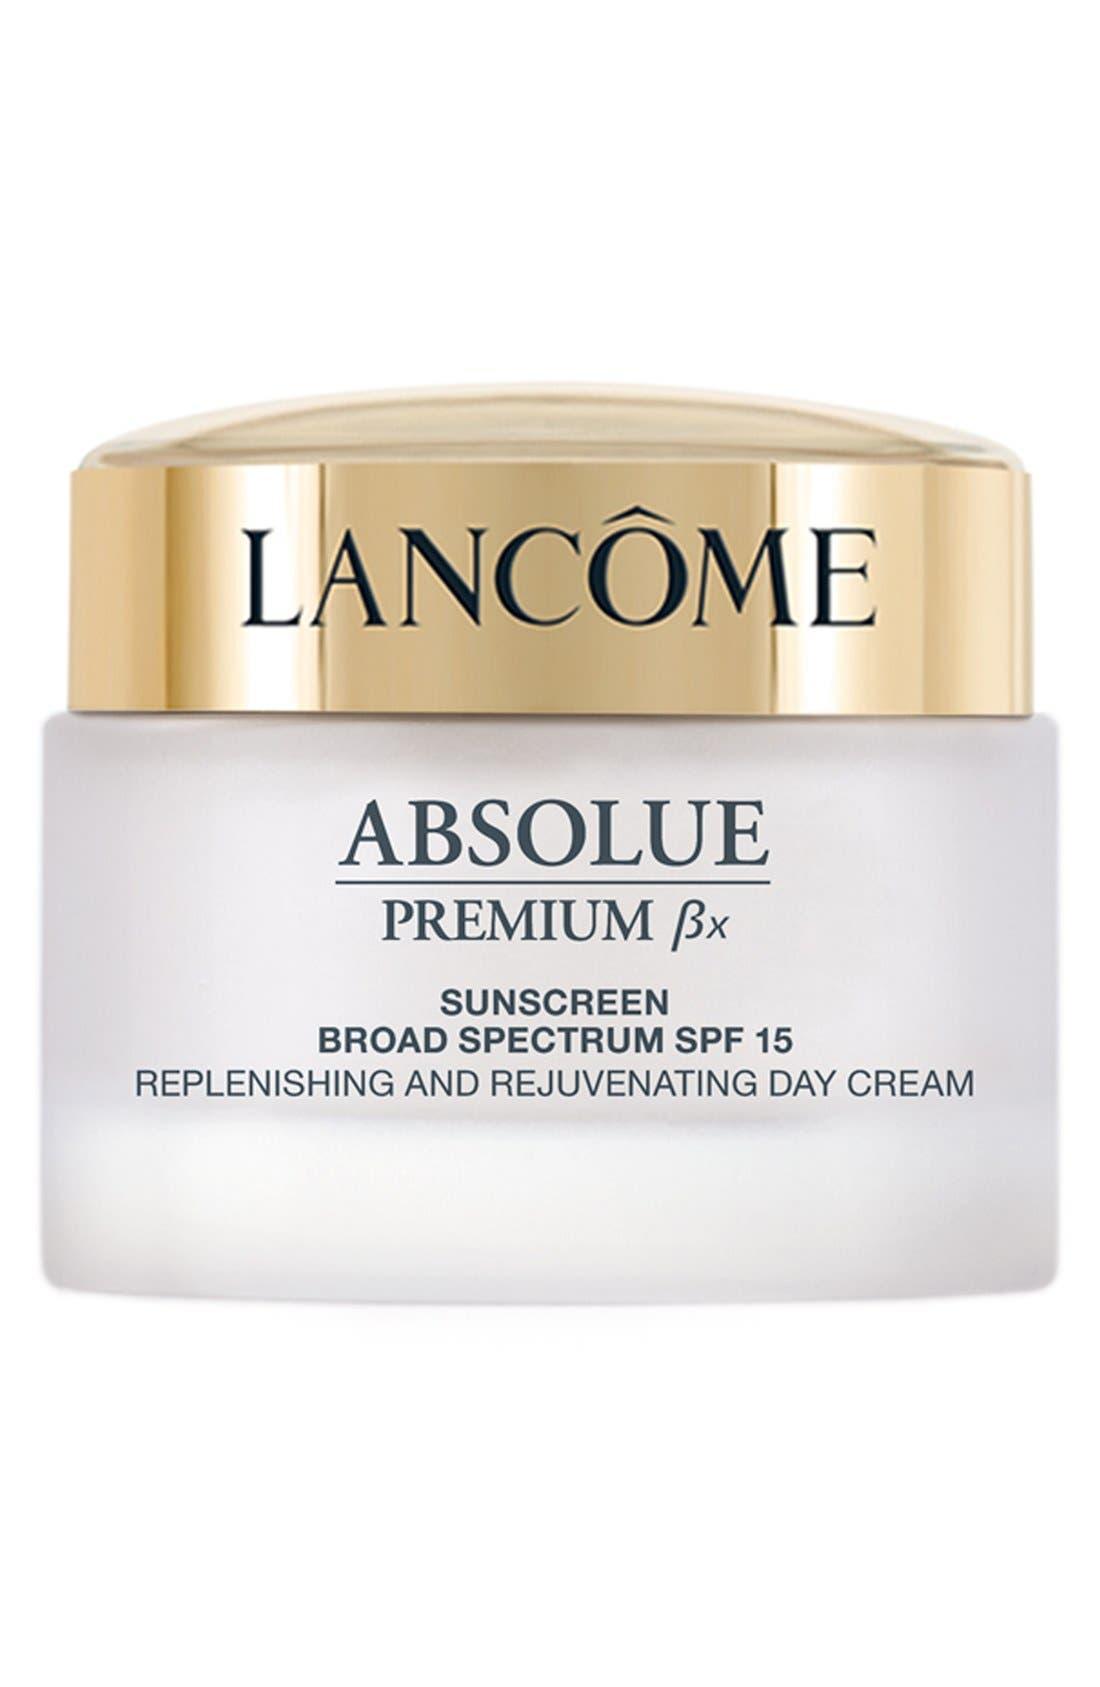 Lancome Absolue Premium Bx Spf 15 Moisturizer Cream